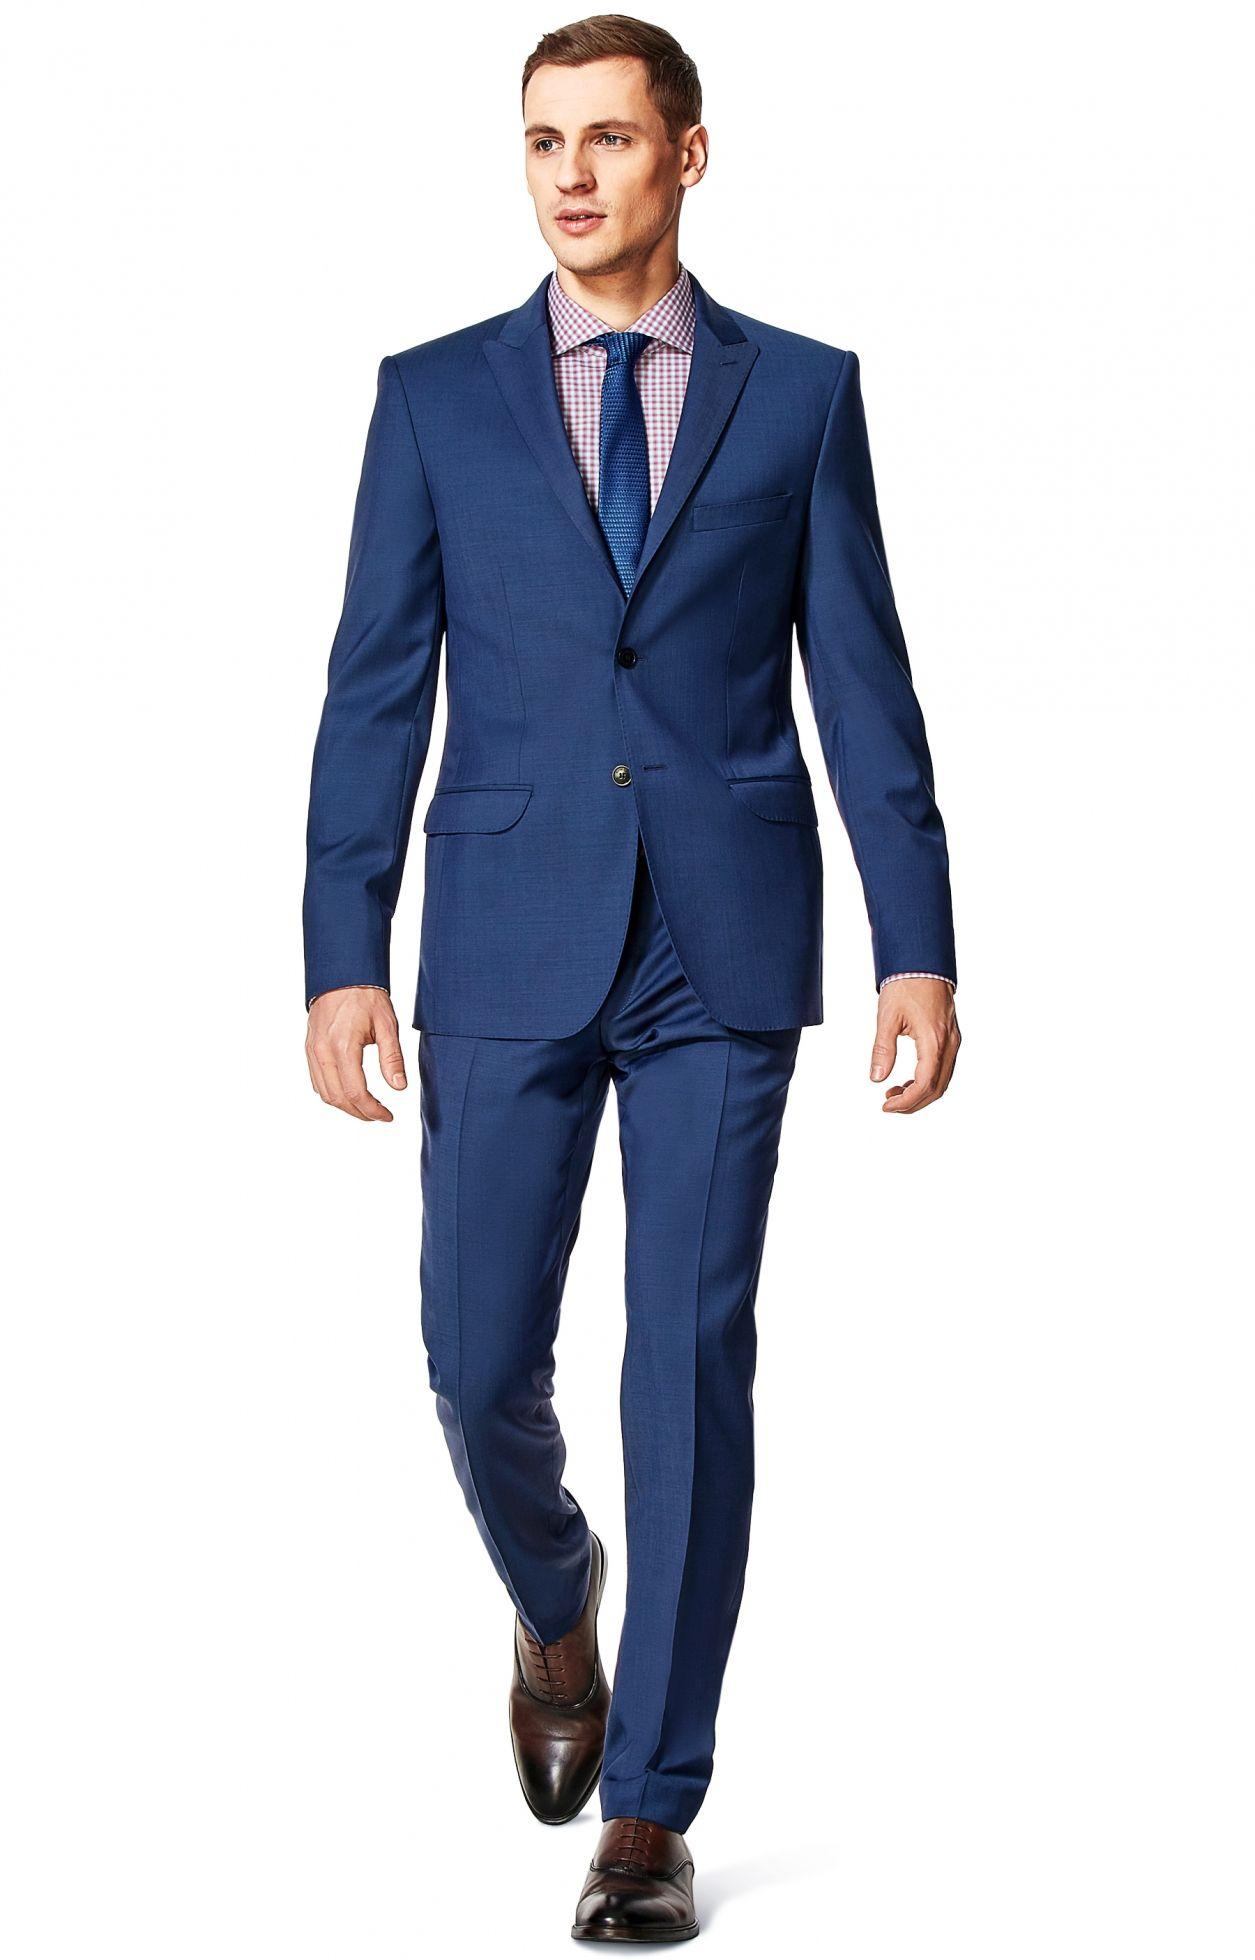 Garnitur New Philo 1299 00 Zl 72724 Mens Formal Wear Mens Designer Fashion Executive Fashion